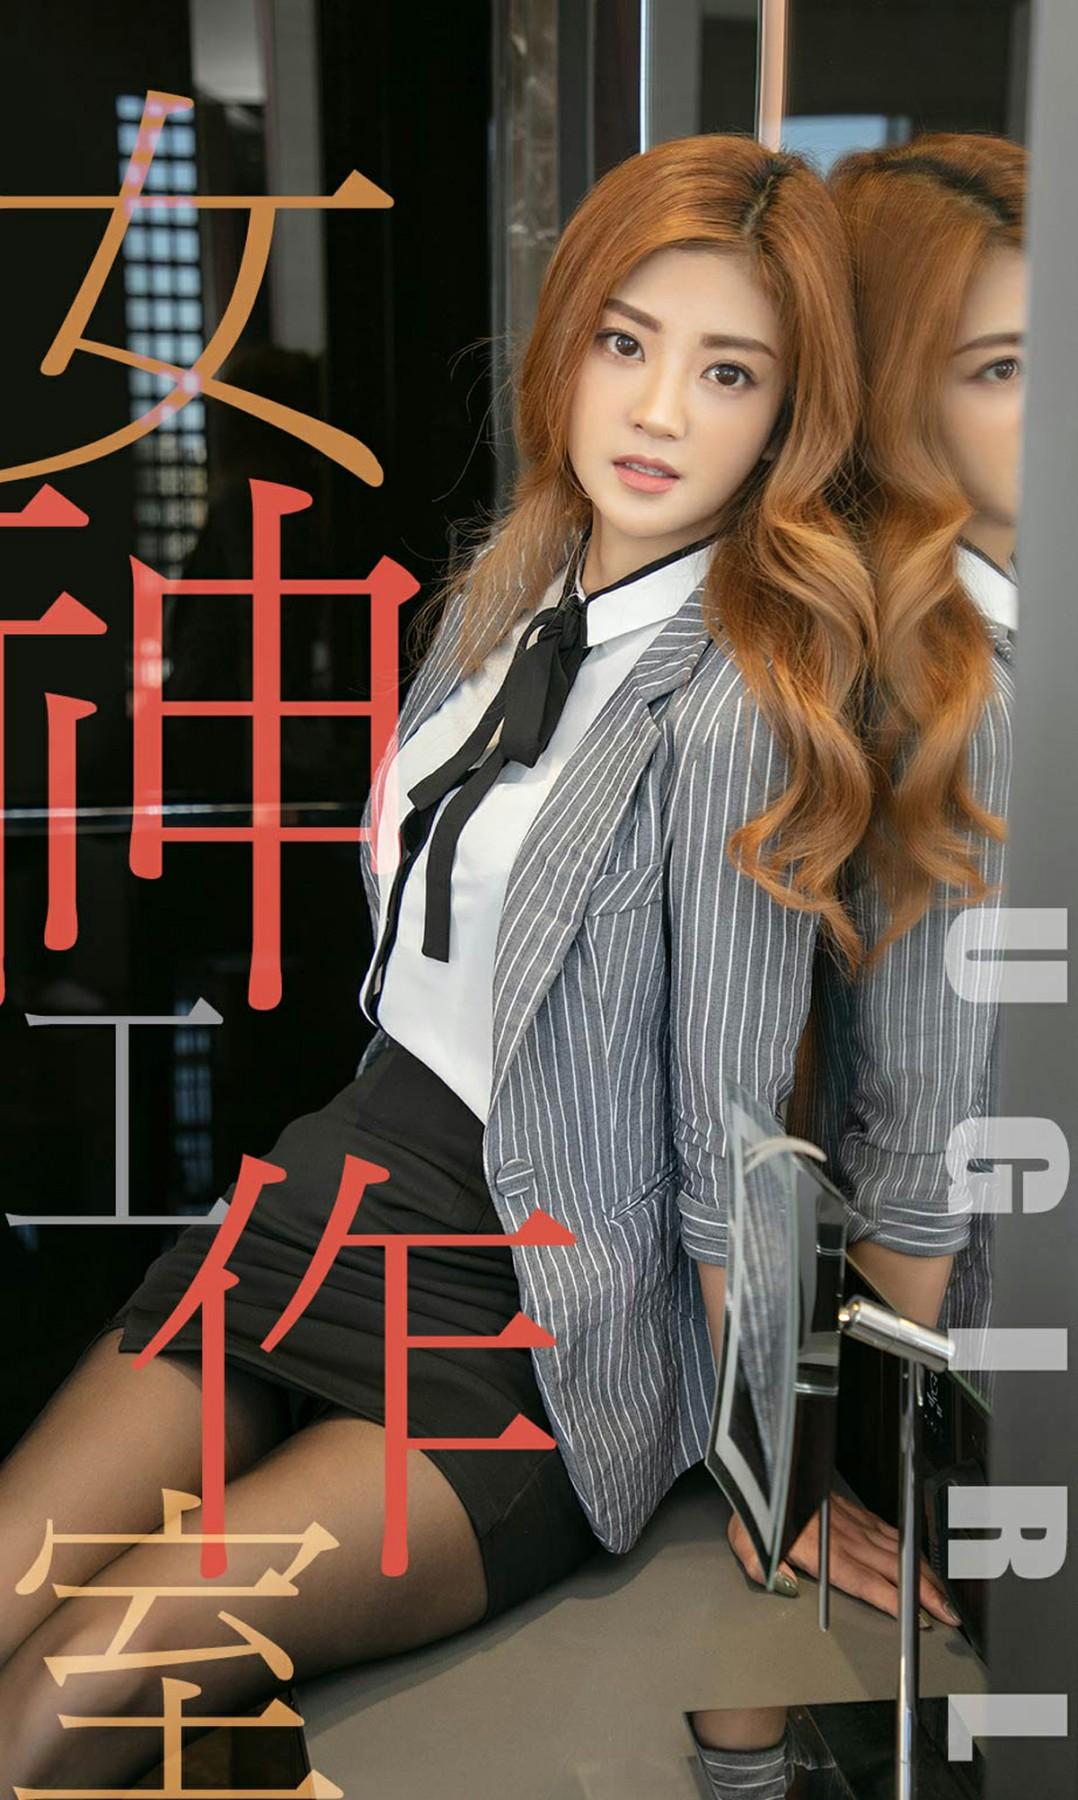 [Ugirls尤果网]爱尤物专辑 2019.06.21 No.1493 琳丽 女神工作室 [35P] 尤果网 第1张